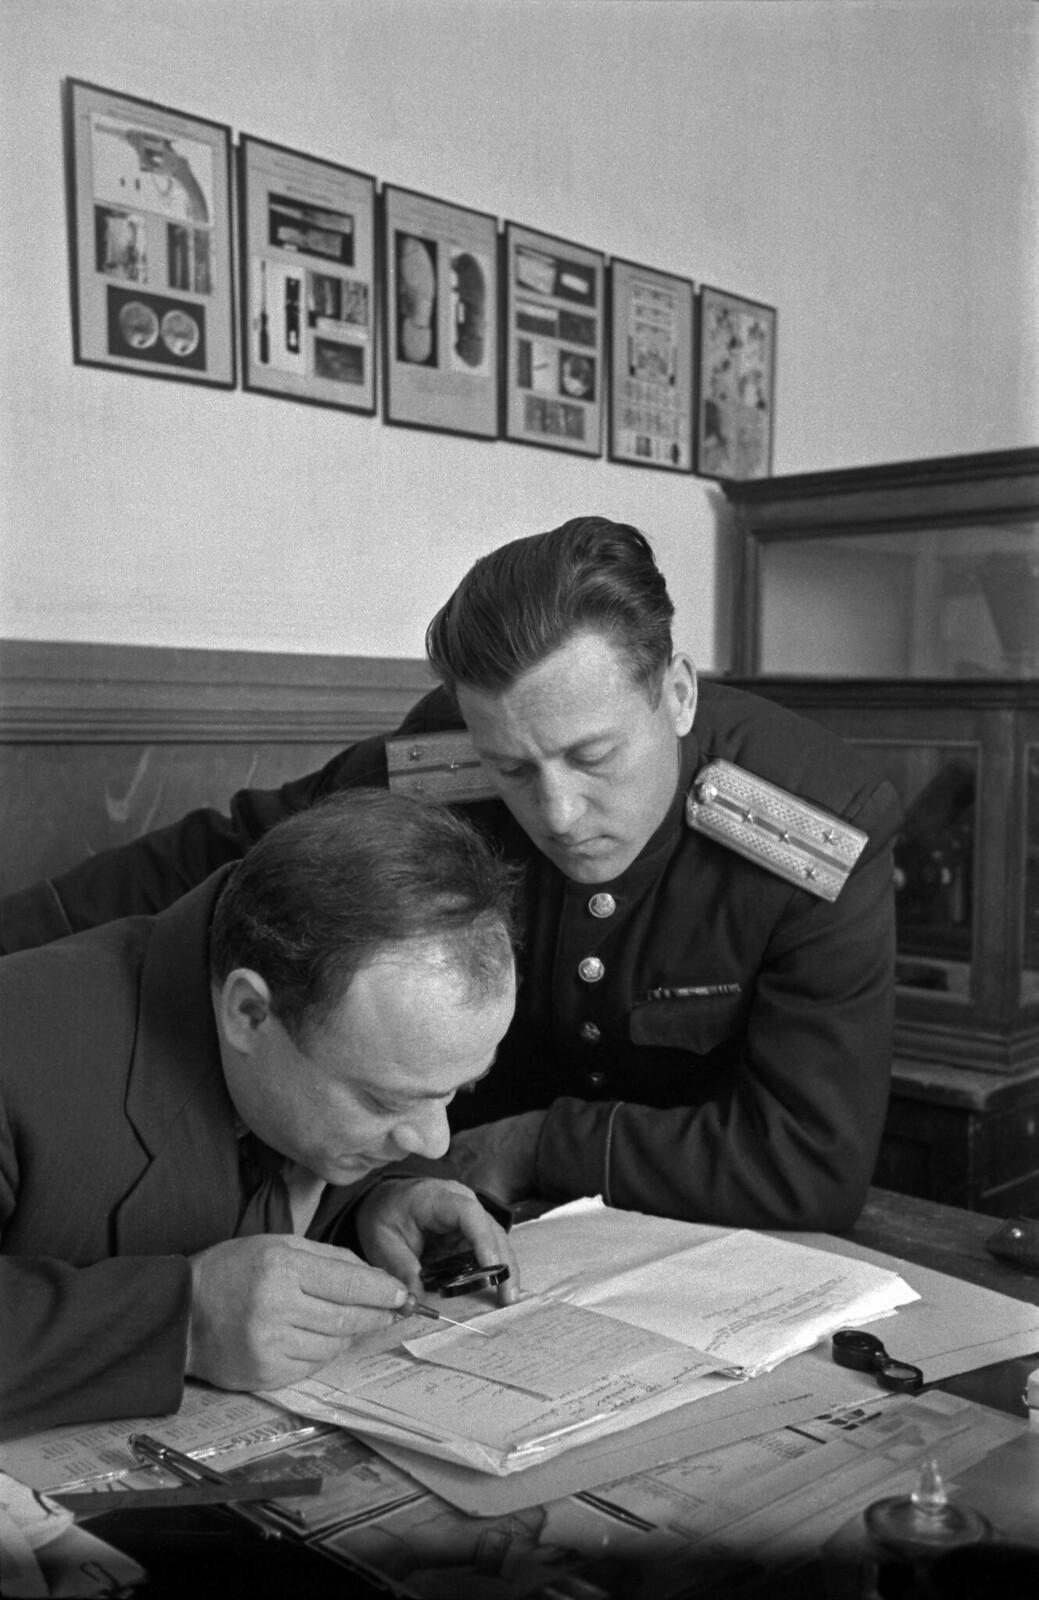 1958.  В научно-техническом отделе Сахалинского областного управления милиции, Южно-Сахалинск